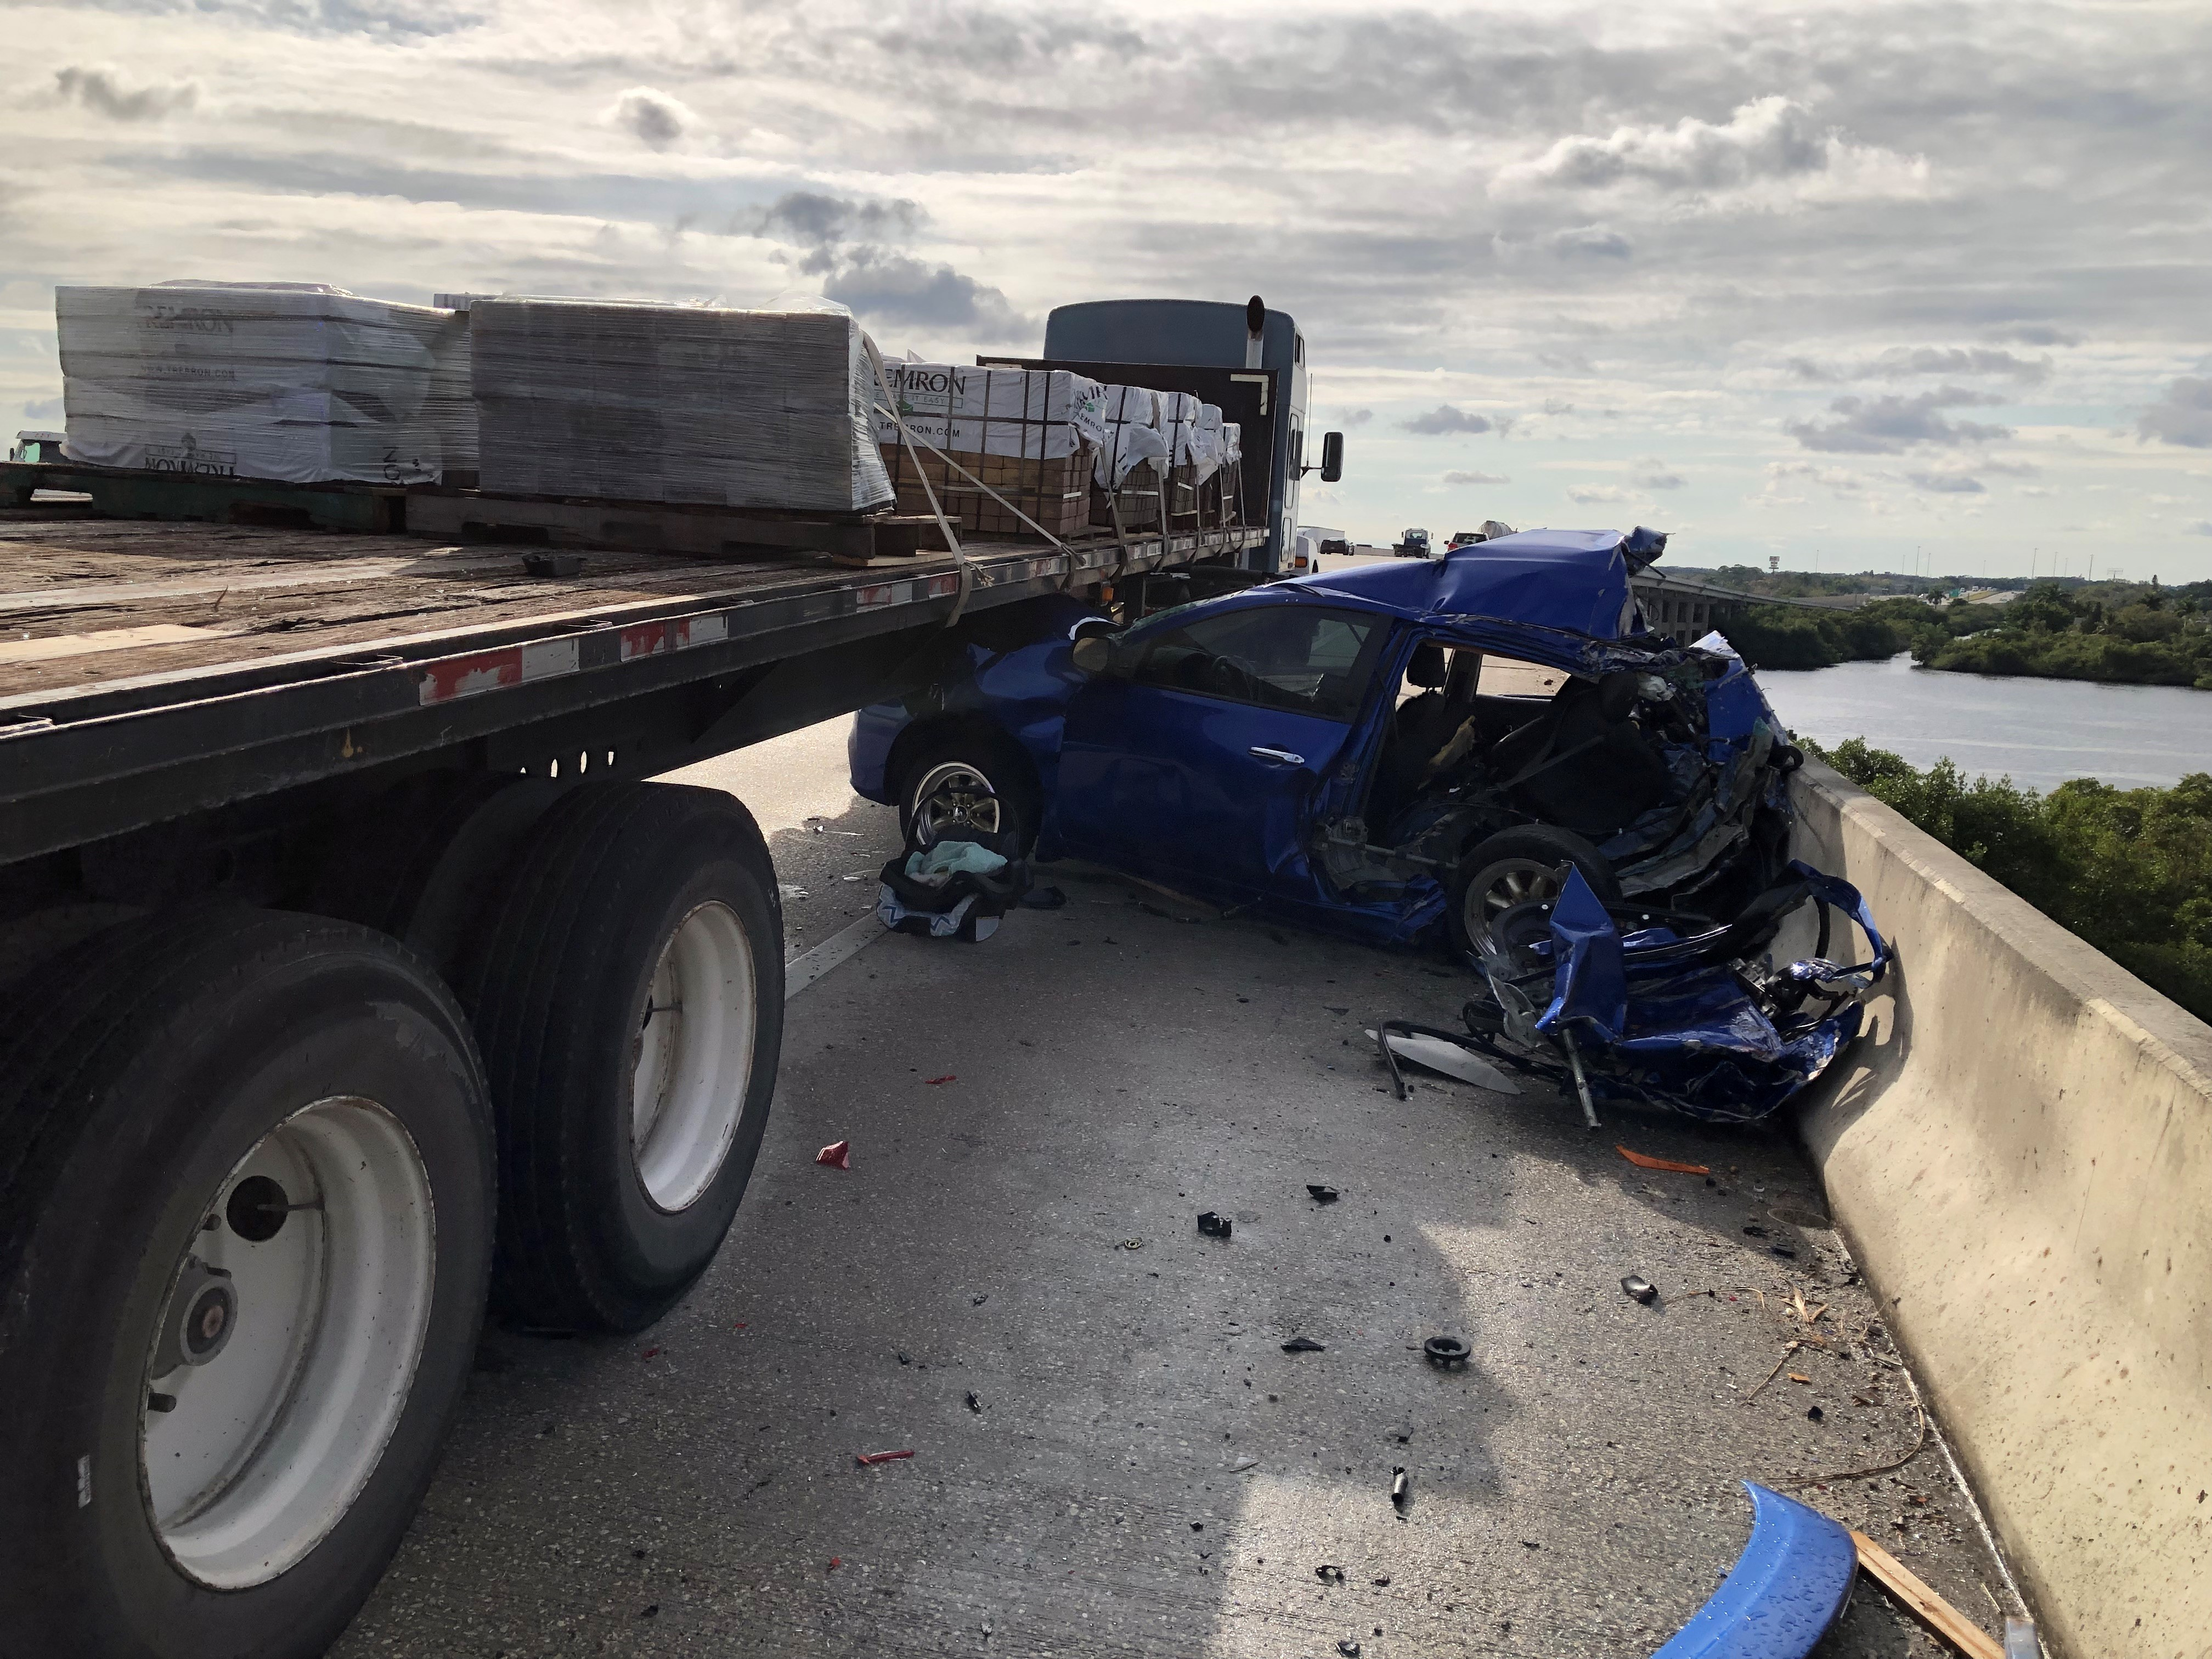 Crash on I-75 in North Fort Myers kills one, leaves infant